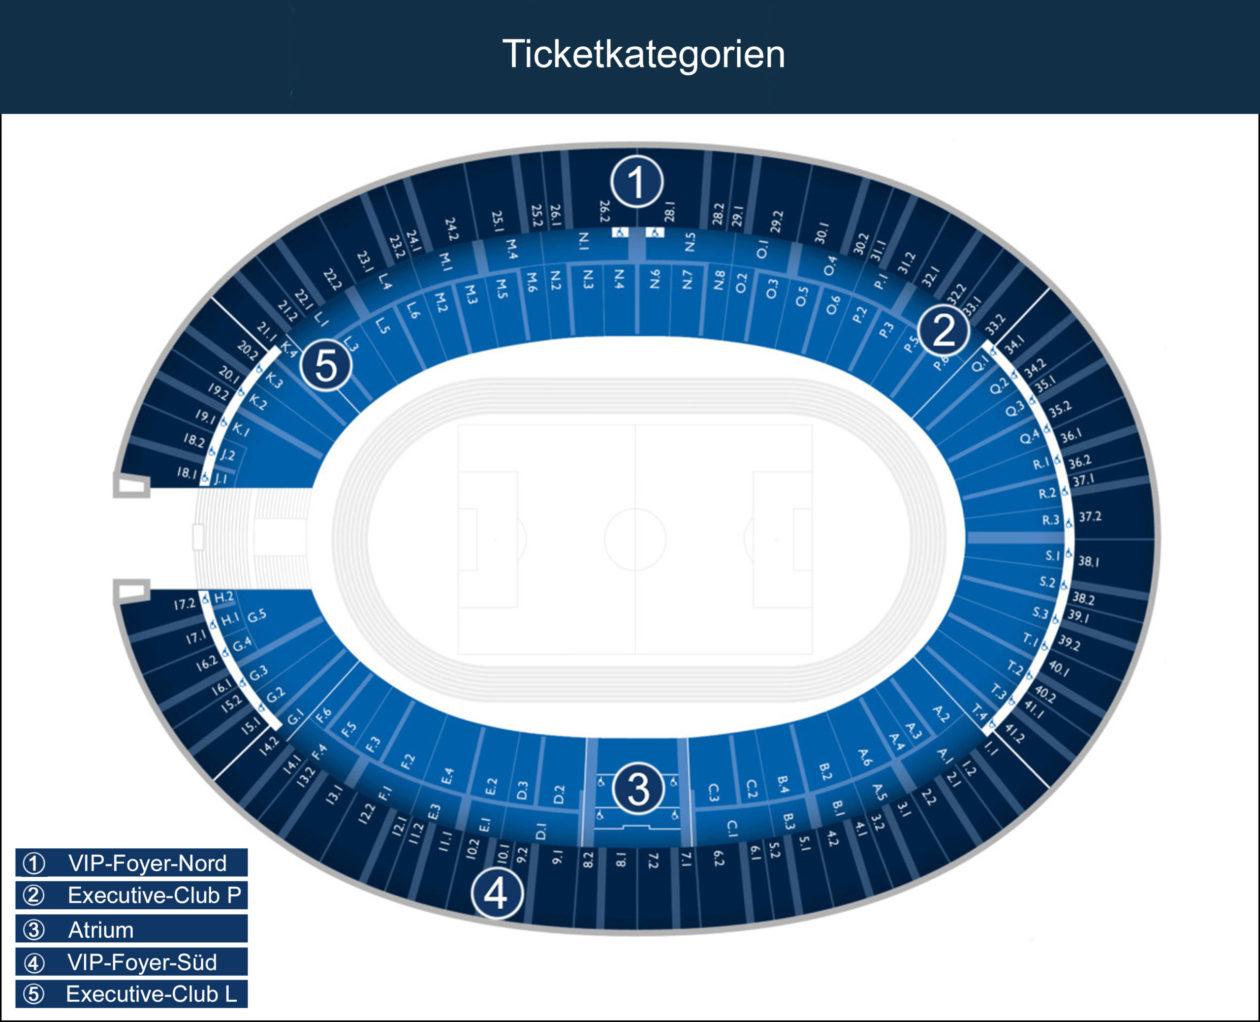 Stadionplan Berliner Olympiastadion - Ticketkategorien